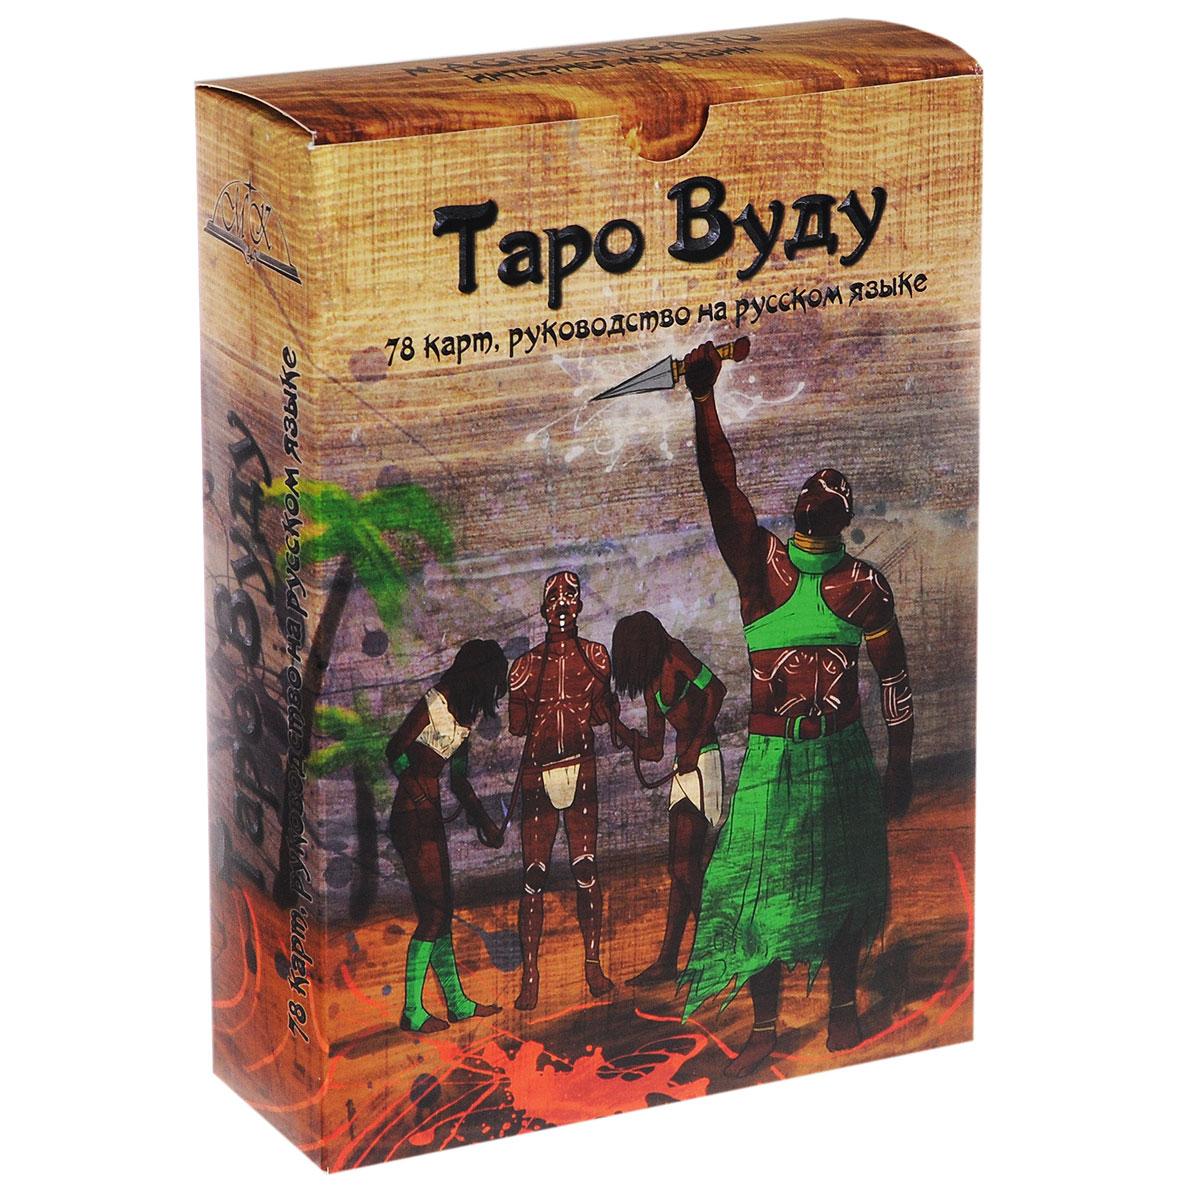 Таро Вуду. Книга-руководство + набор из 78 карт